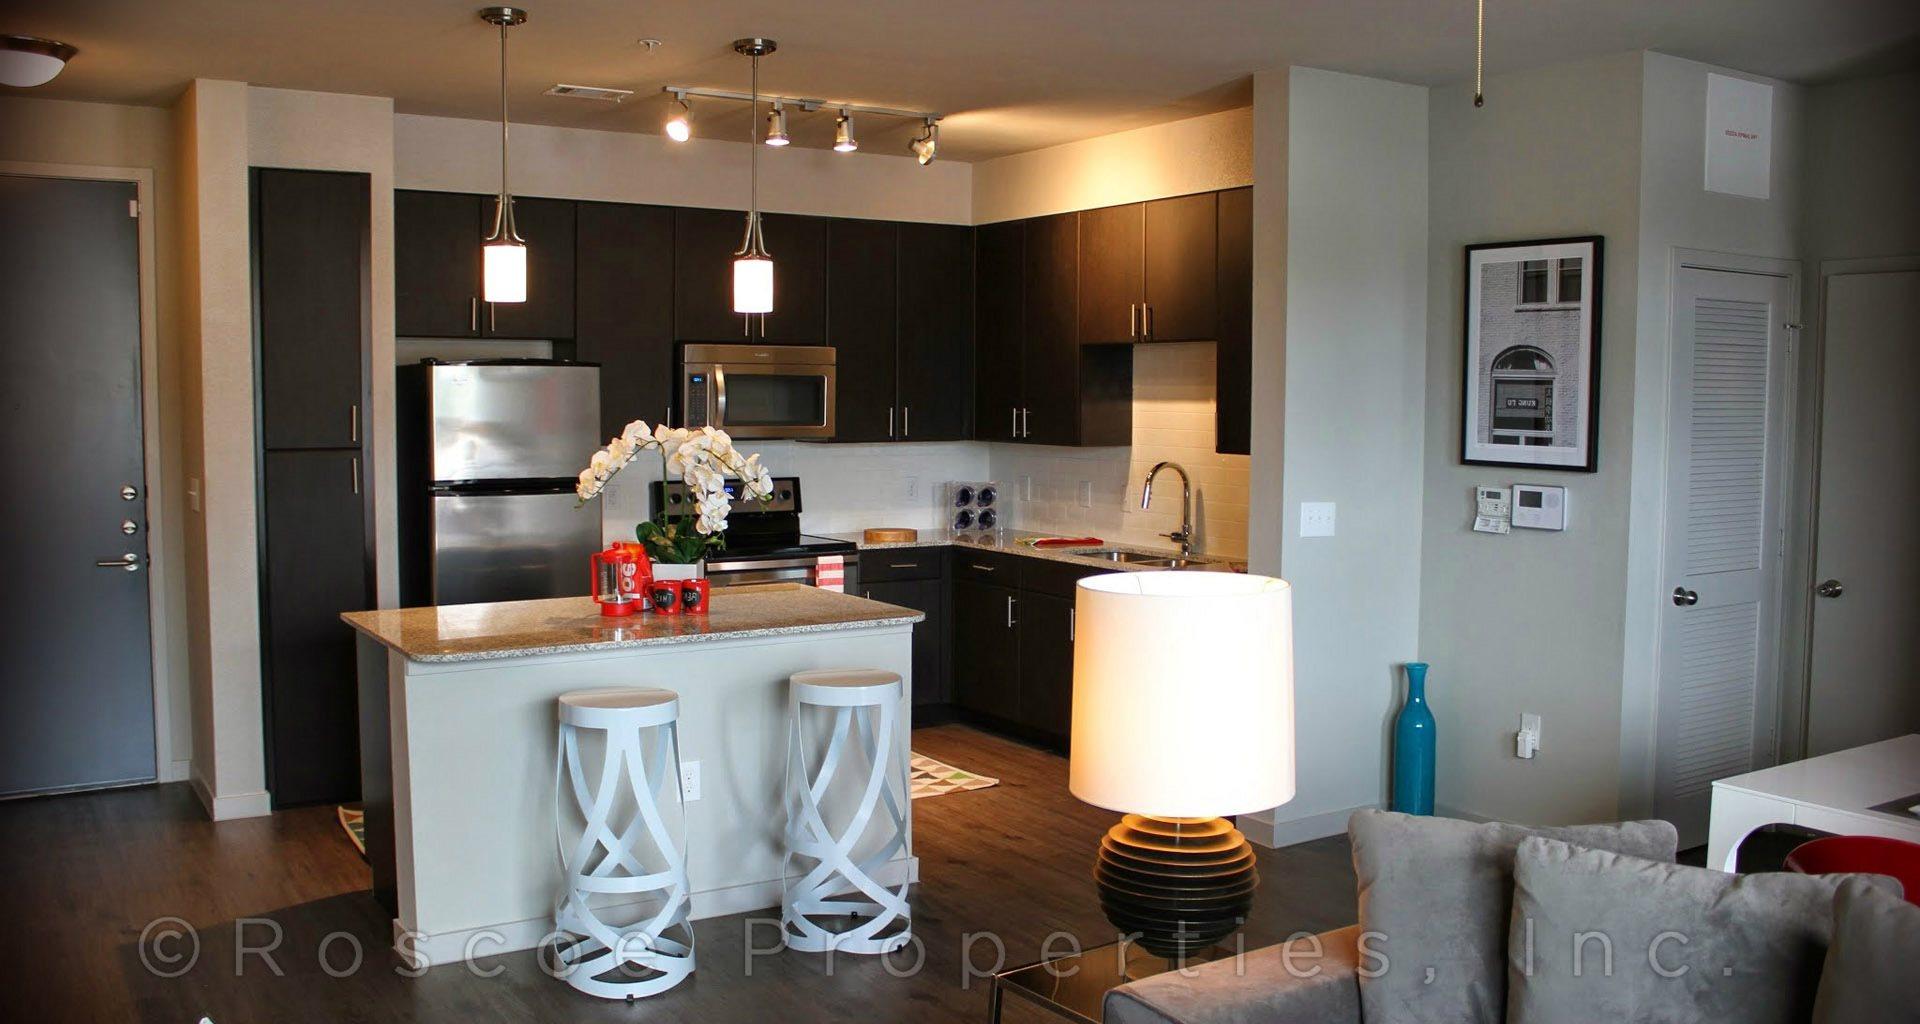 1111 Austin Highway Apartments in San Antonio kitchen